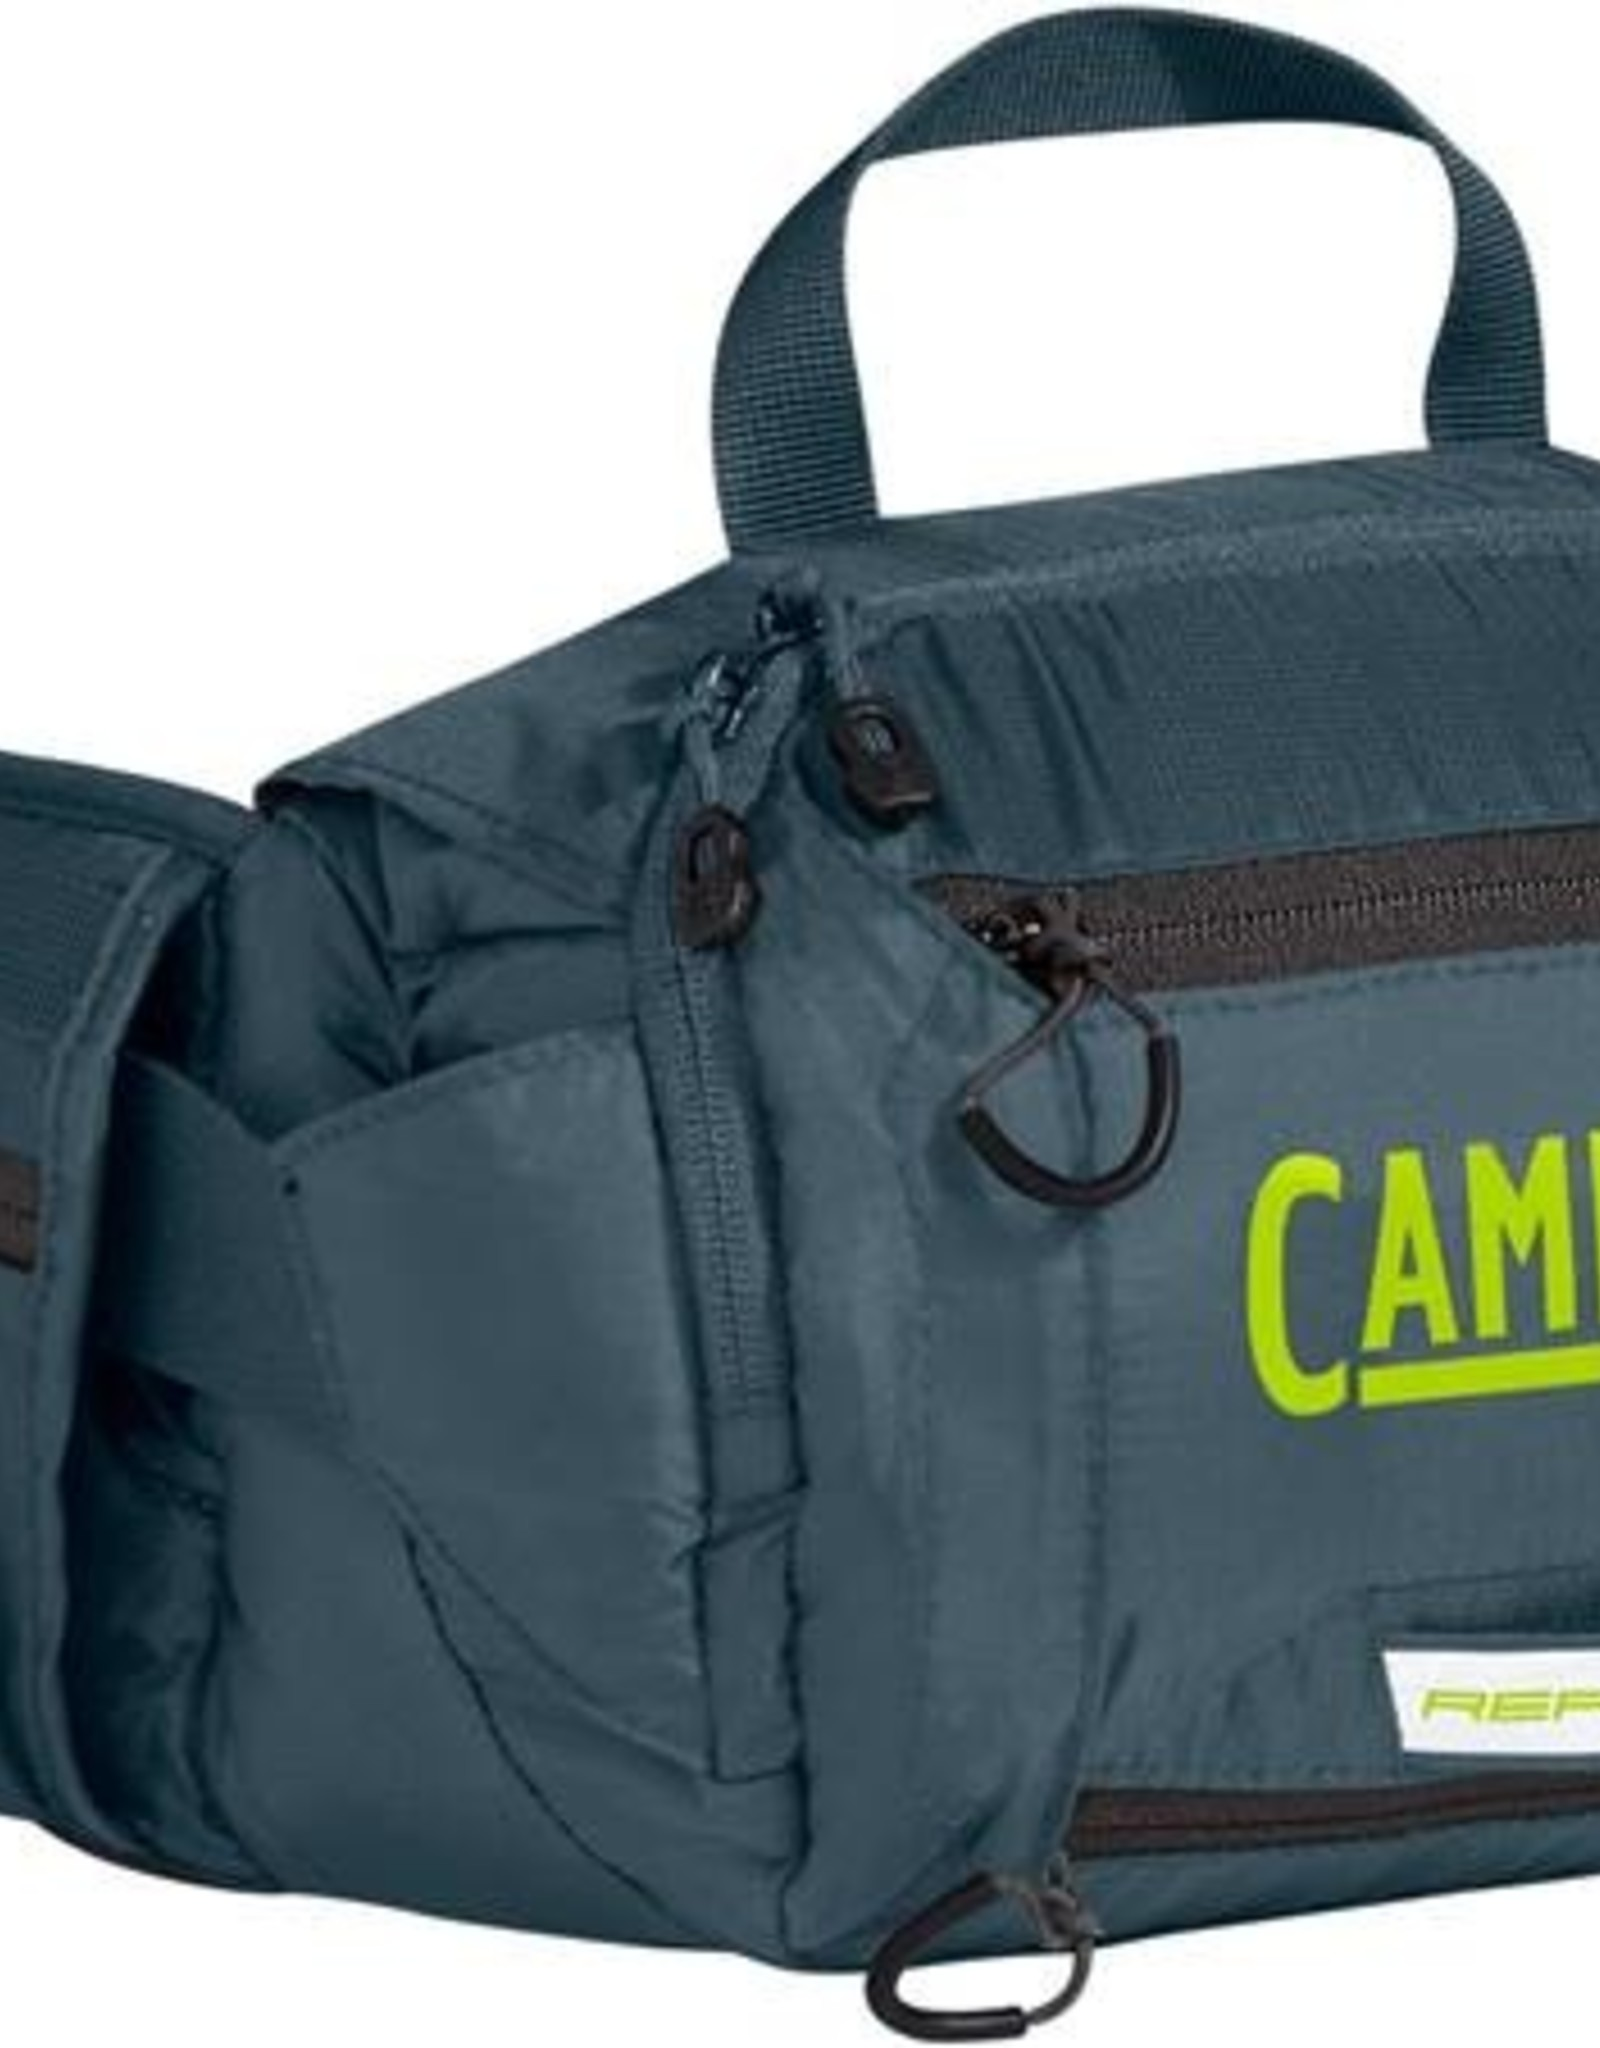 Camelbak Repack LR 4 50oz